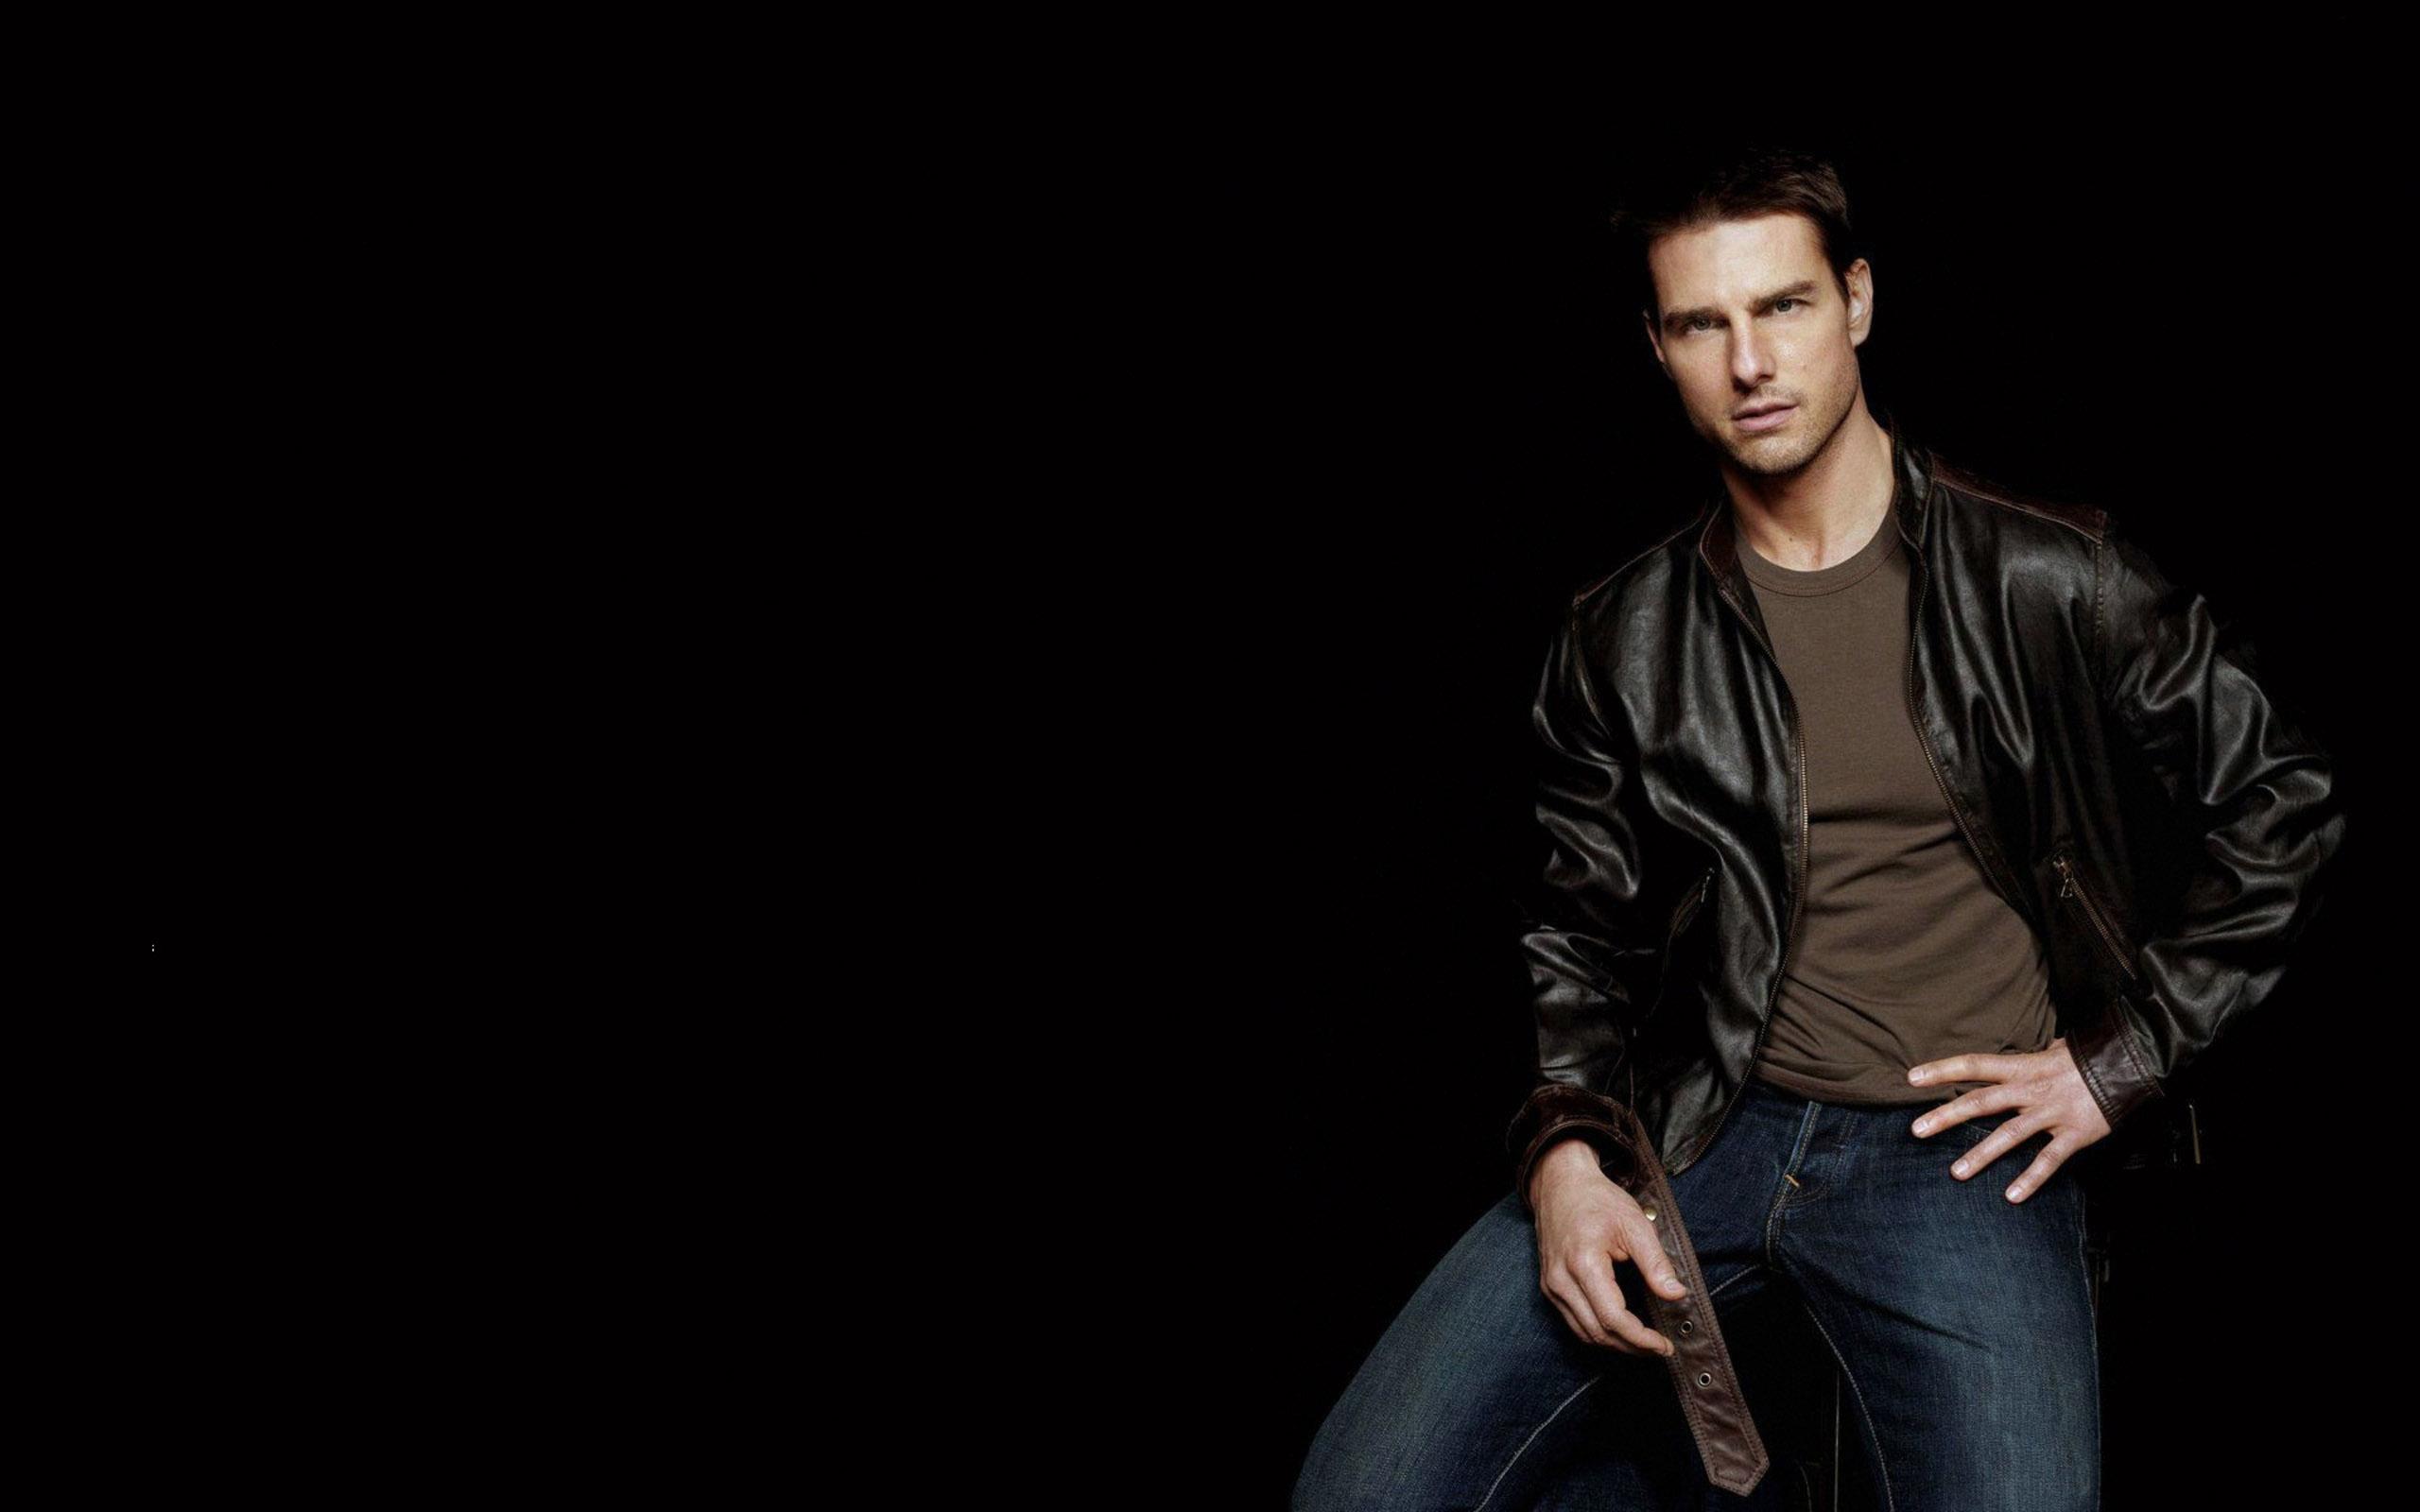 Tom Cruise Wallpaper 16